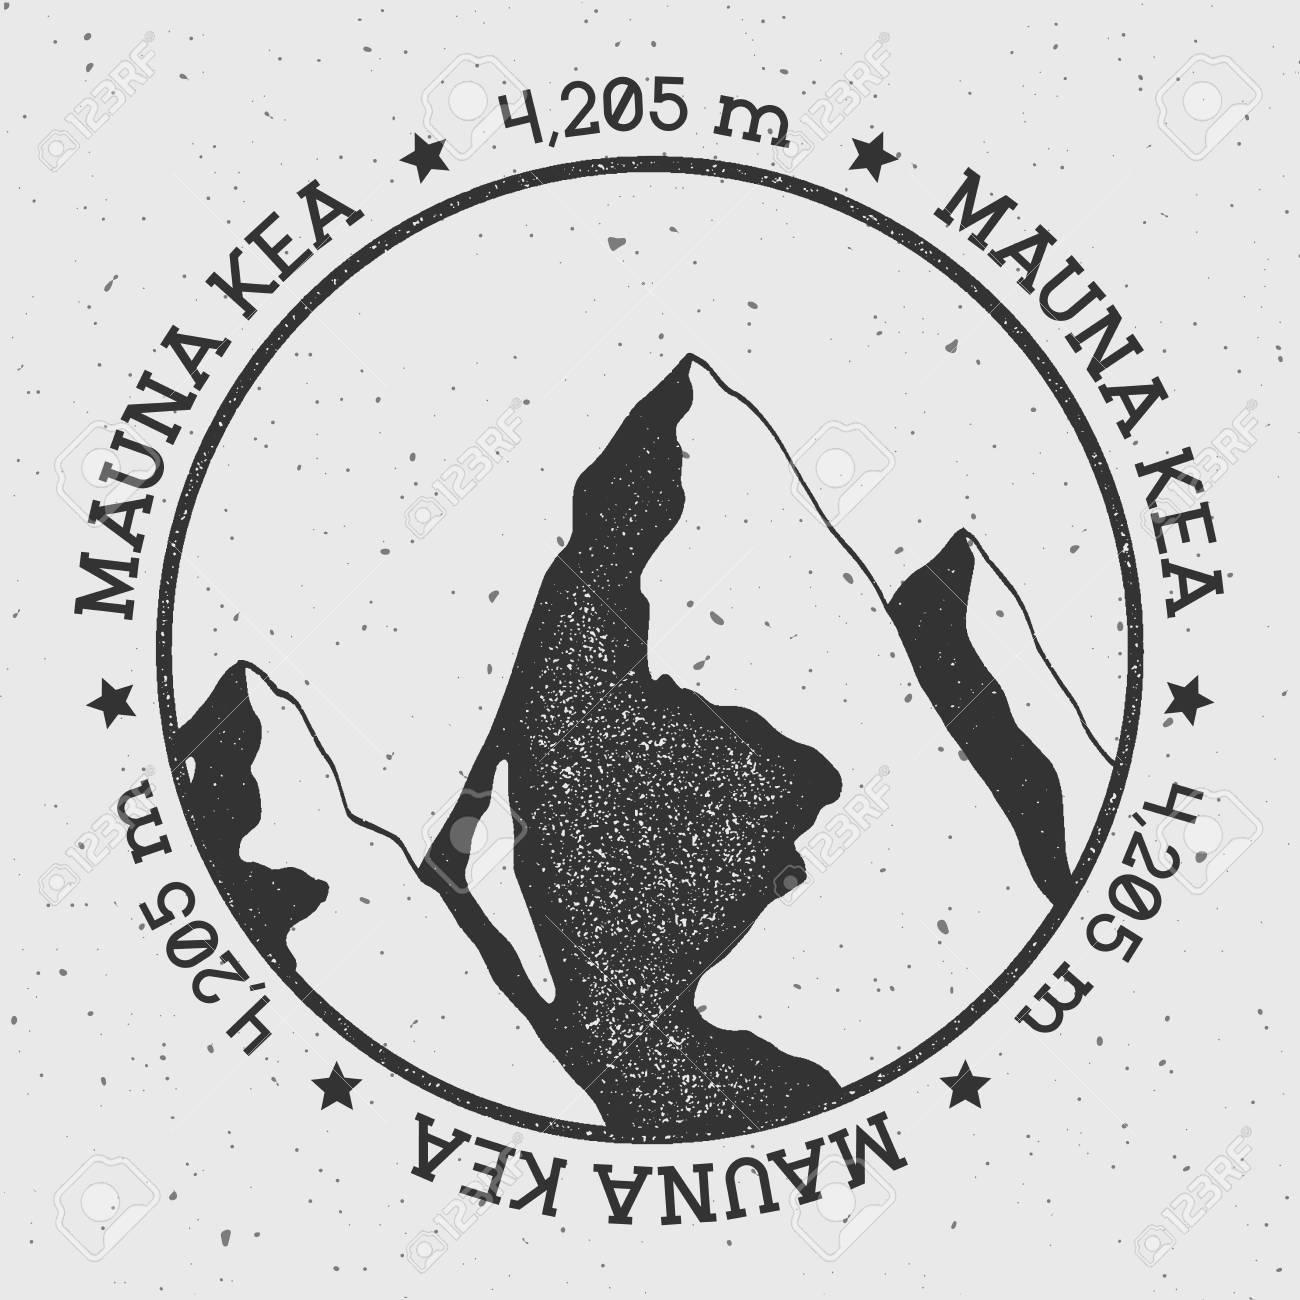 Mauna Kea in Hawaii, USA outdoor adventure logo  Round stamp